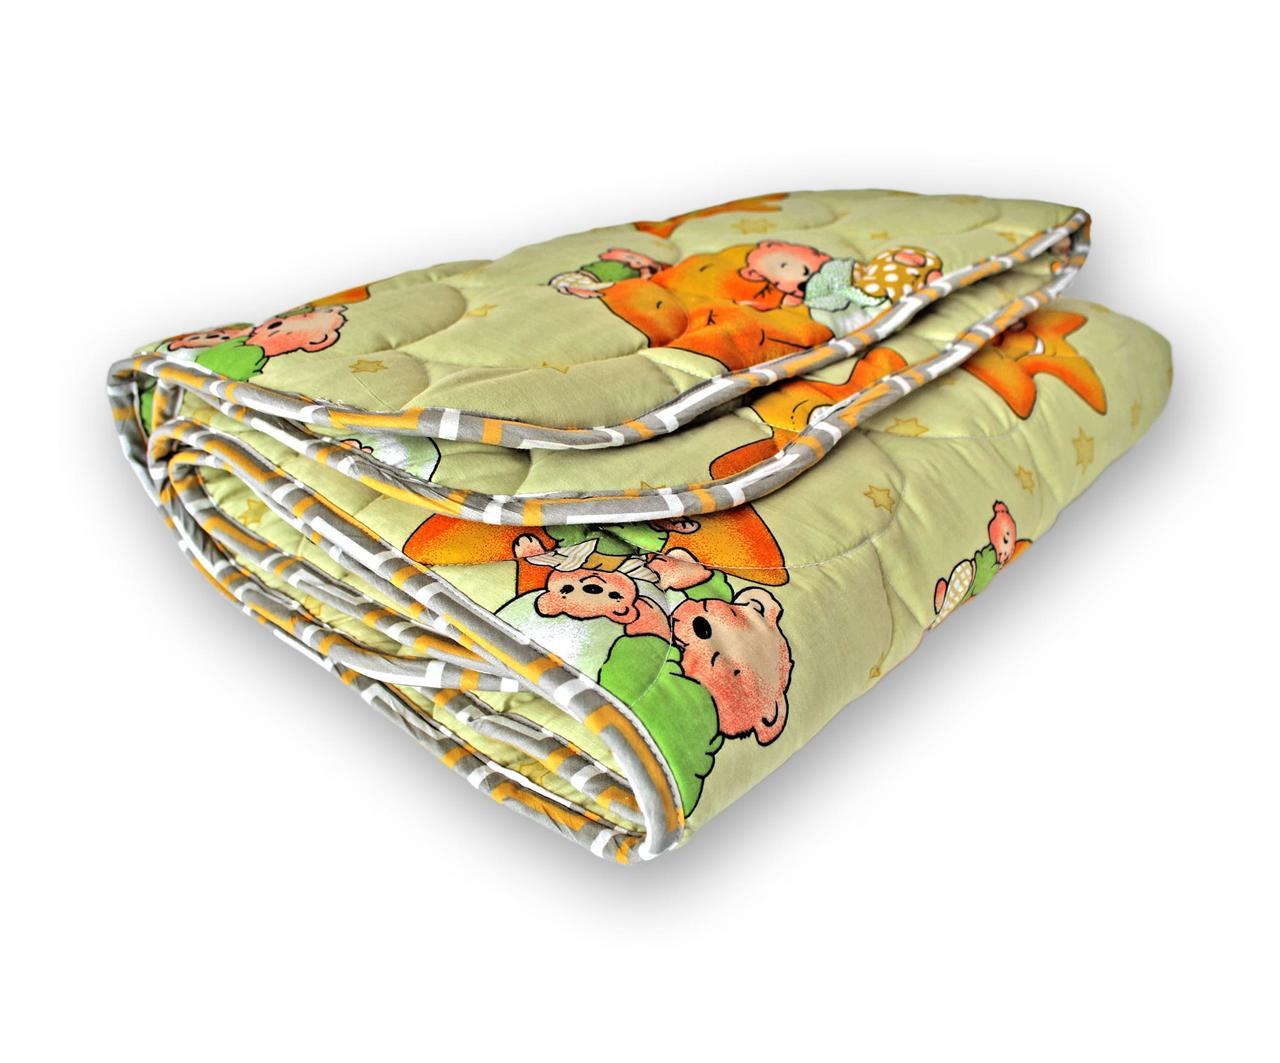 Одеяло стеганое зимнее QSLEEP полуторное Евро 155*215 см